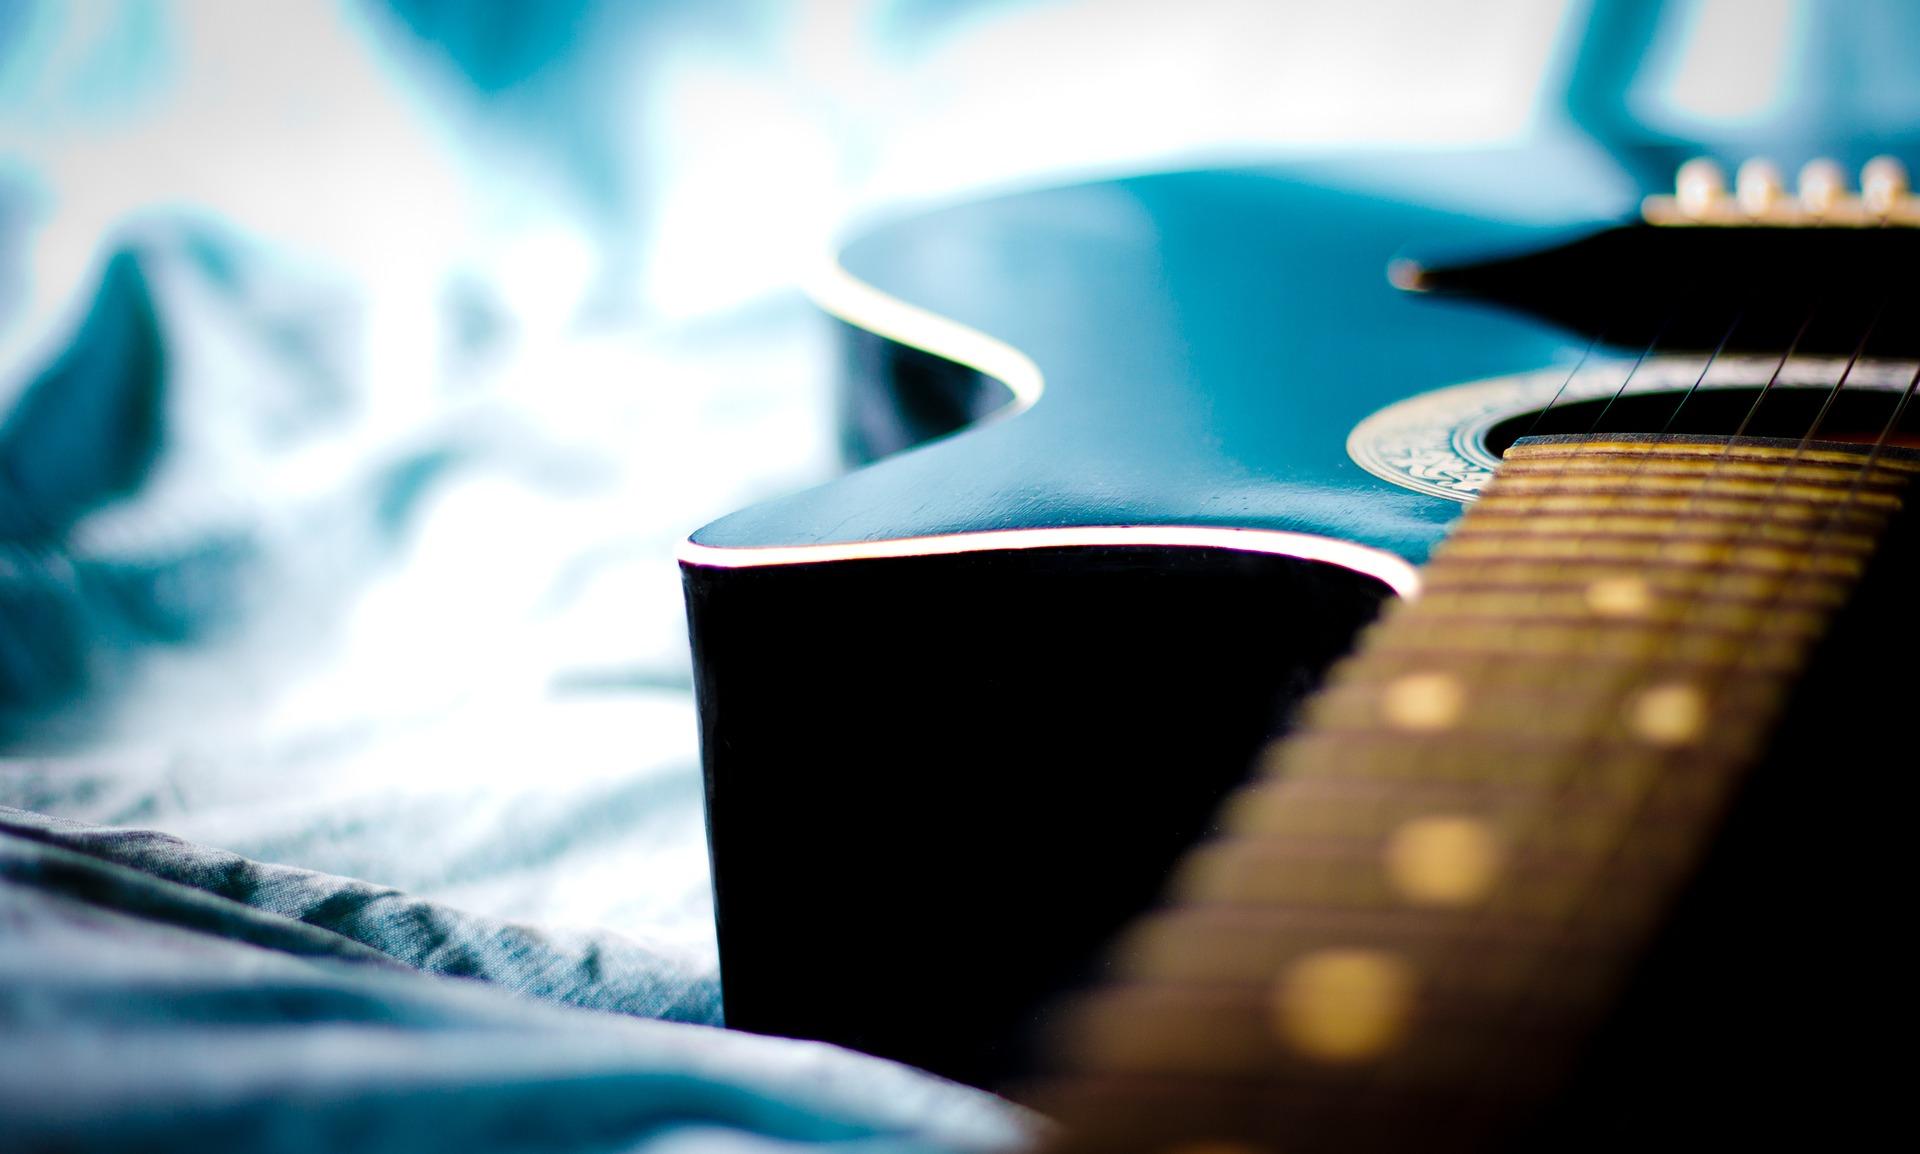 Гитара, строки, Песня, творчество, Искусство, Аккорд - Обои HD - Профессор falken.com